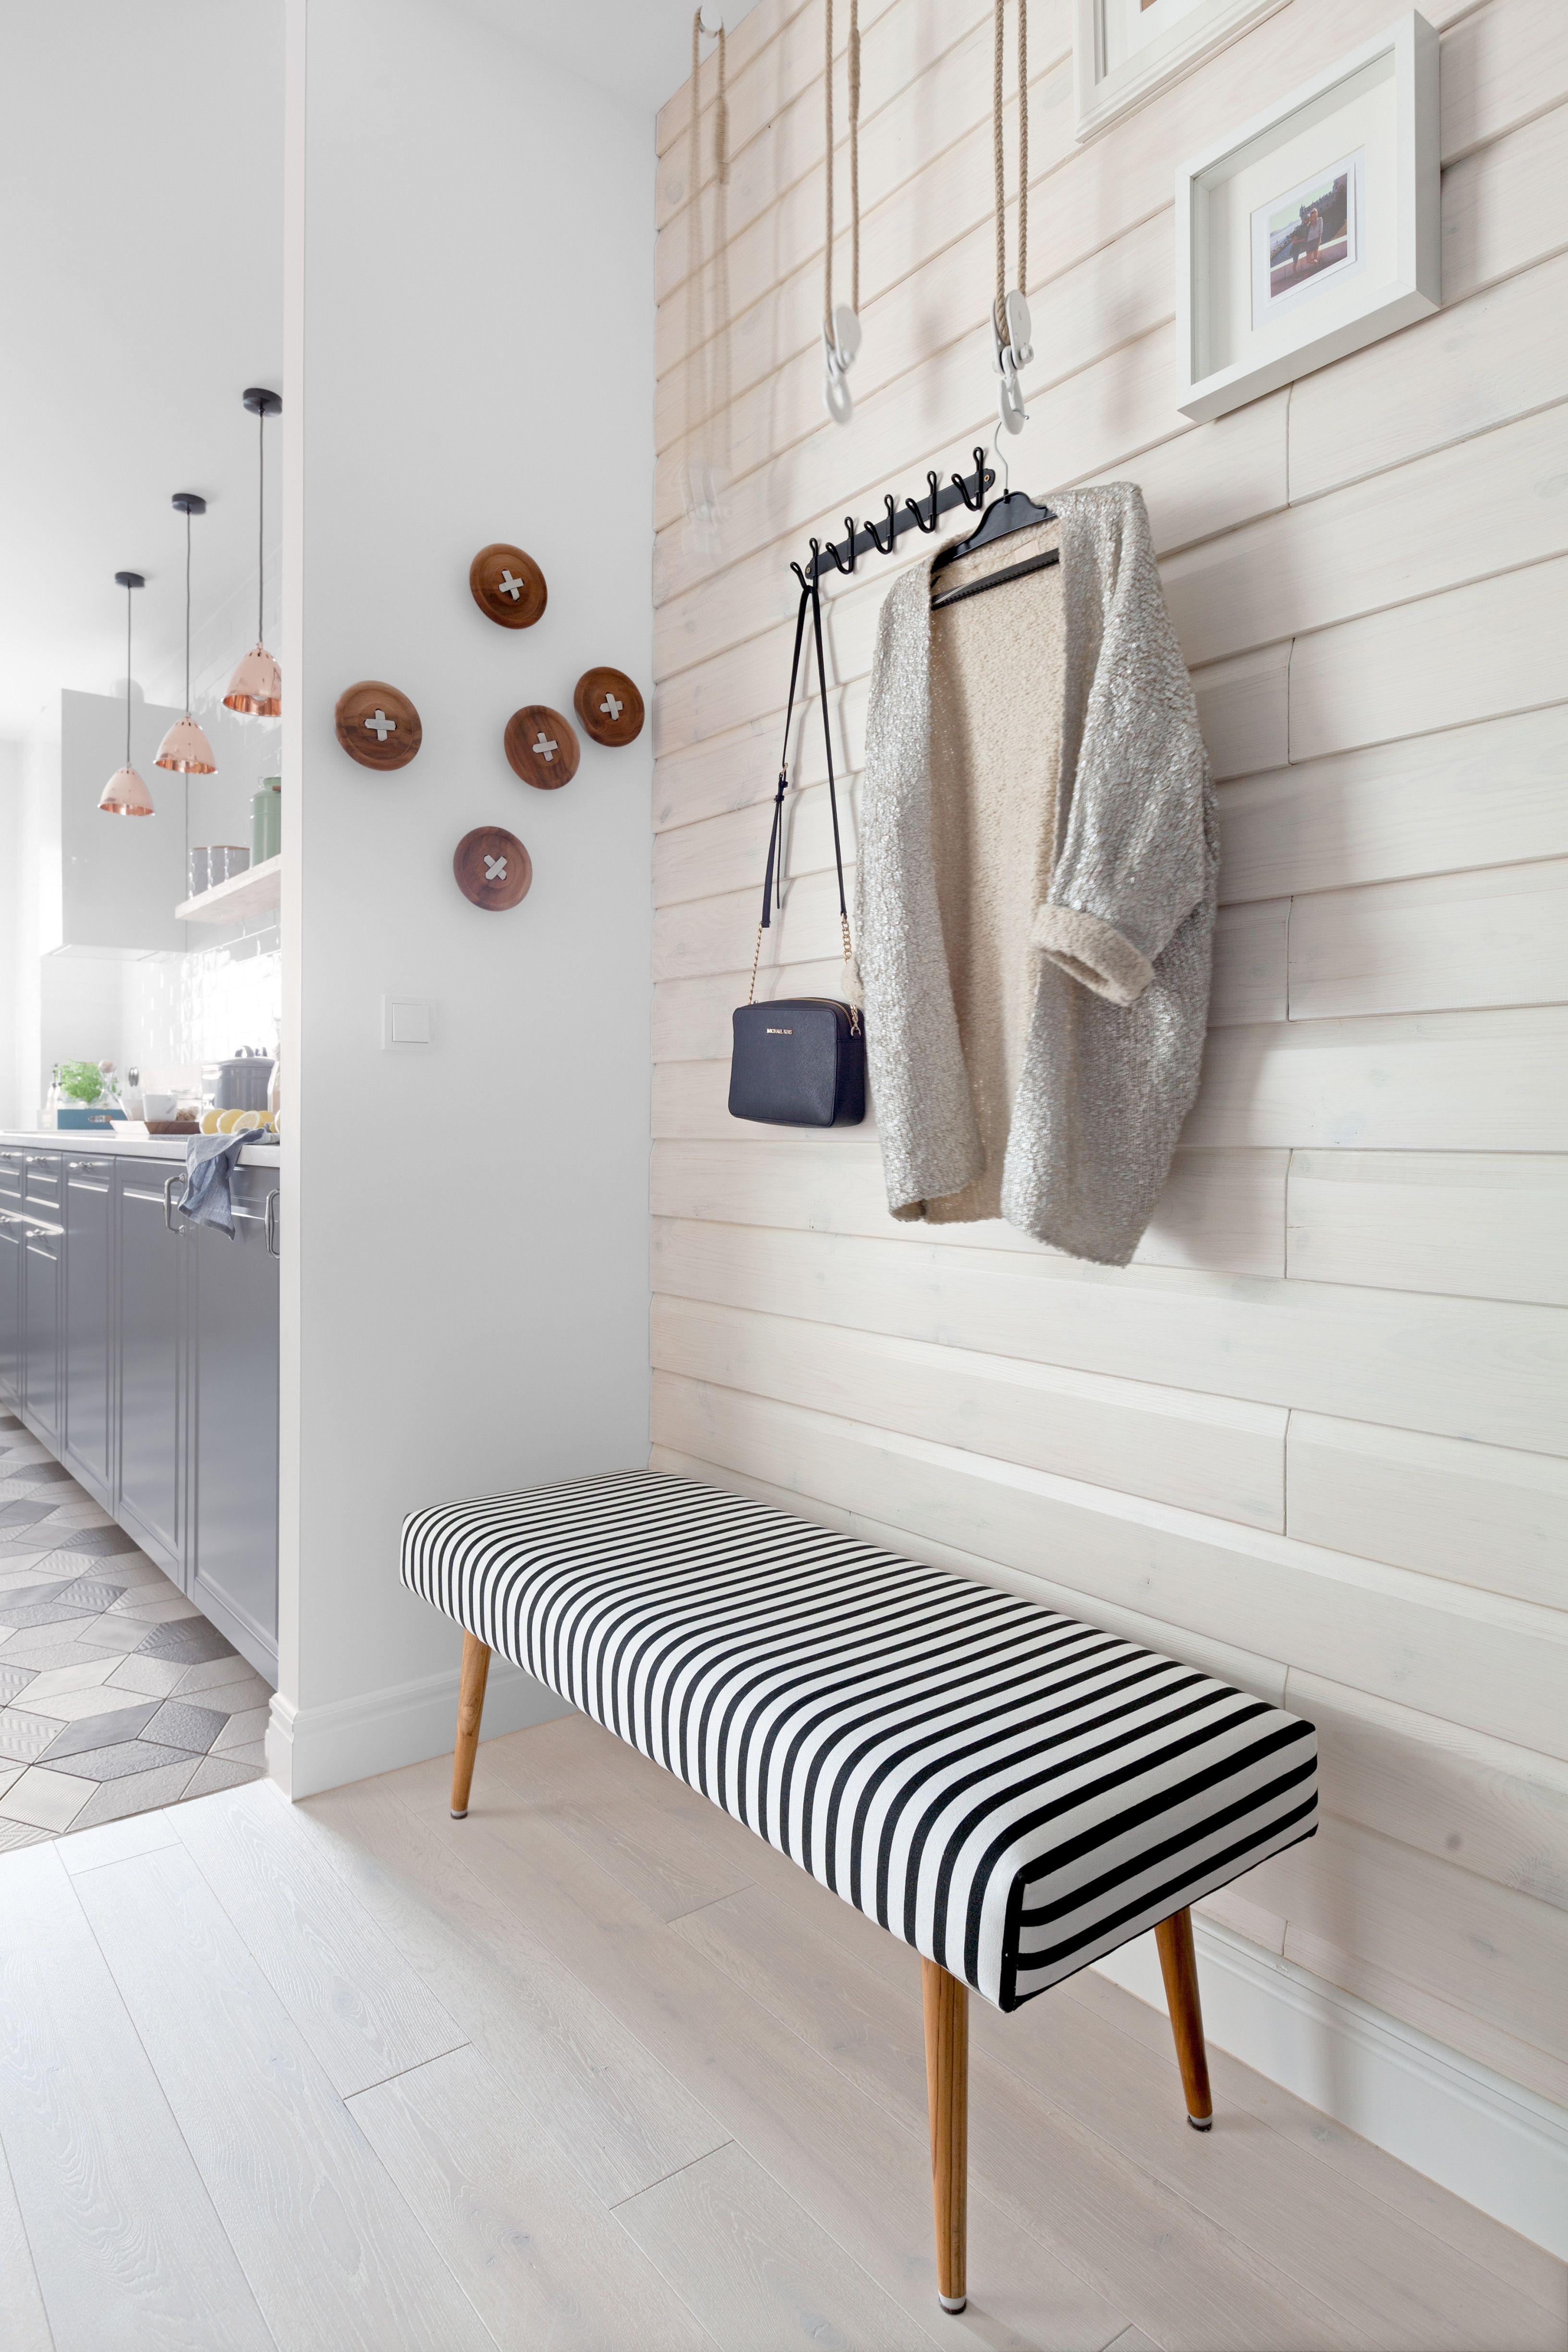 Home hall design-ideen przedpokój  szukaj w google  ideen rund ums haus  pinterest